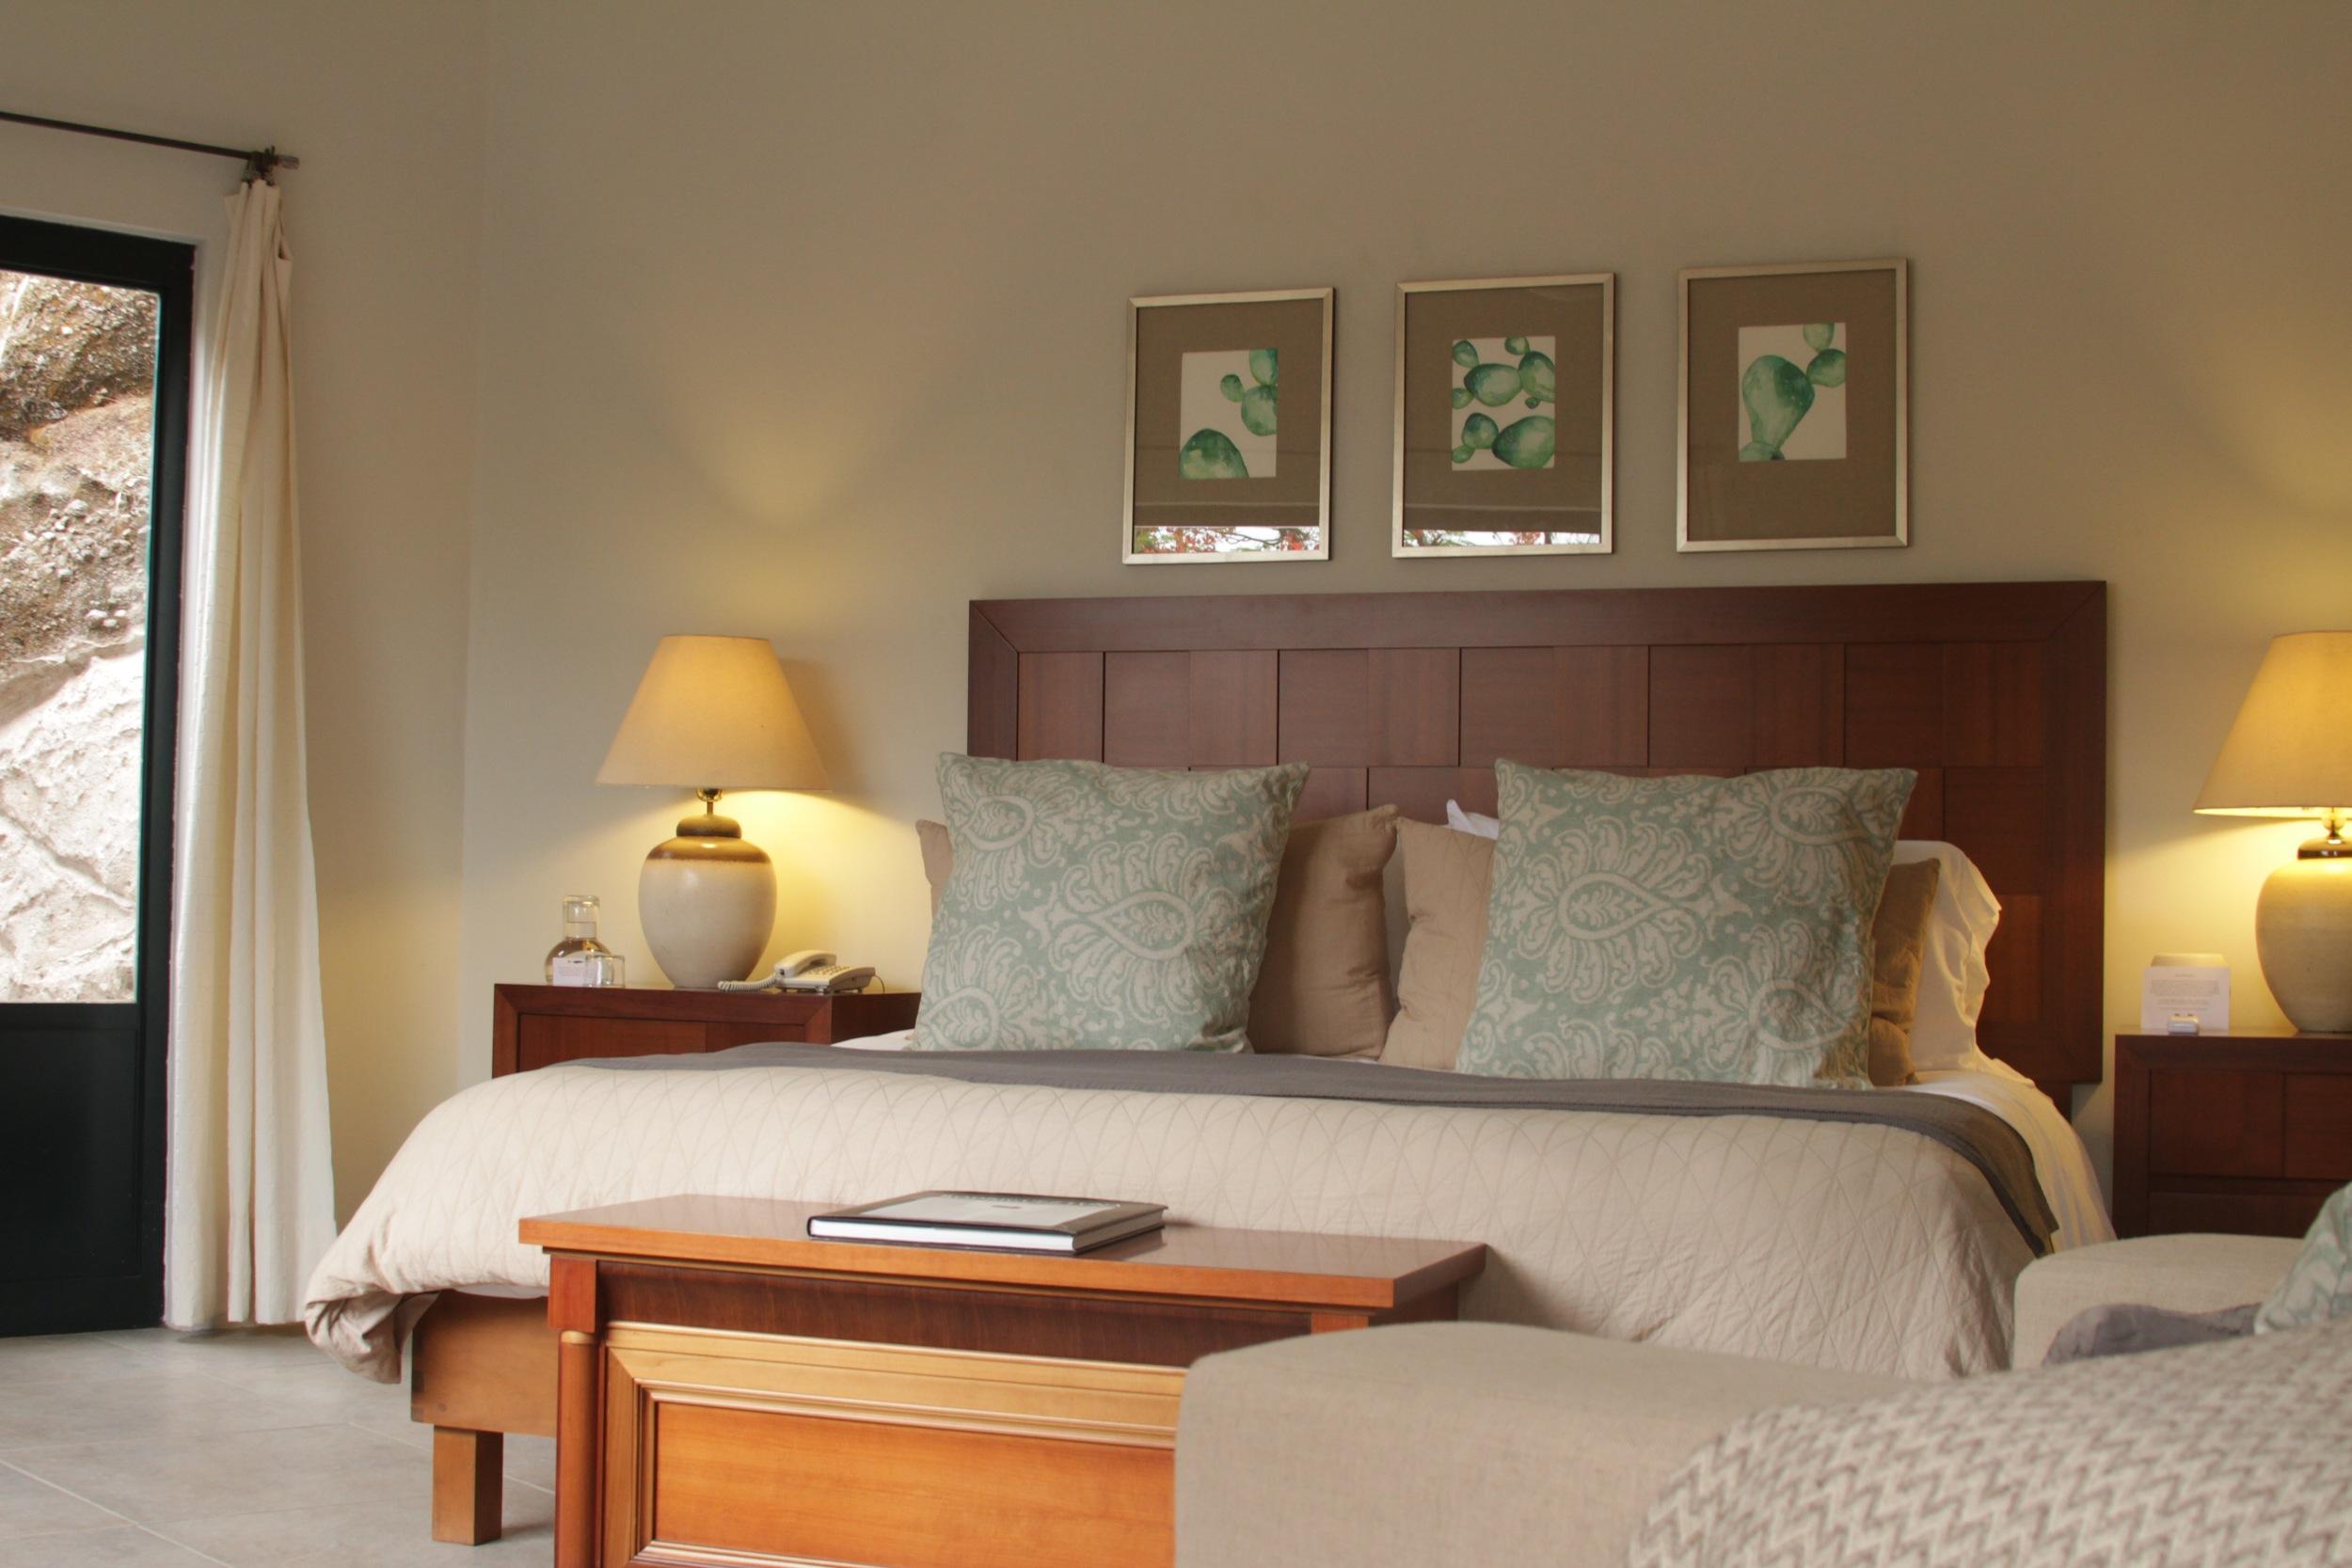 Topacio Room at Hotel in Malinalco, Mexico